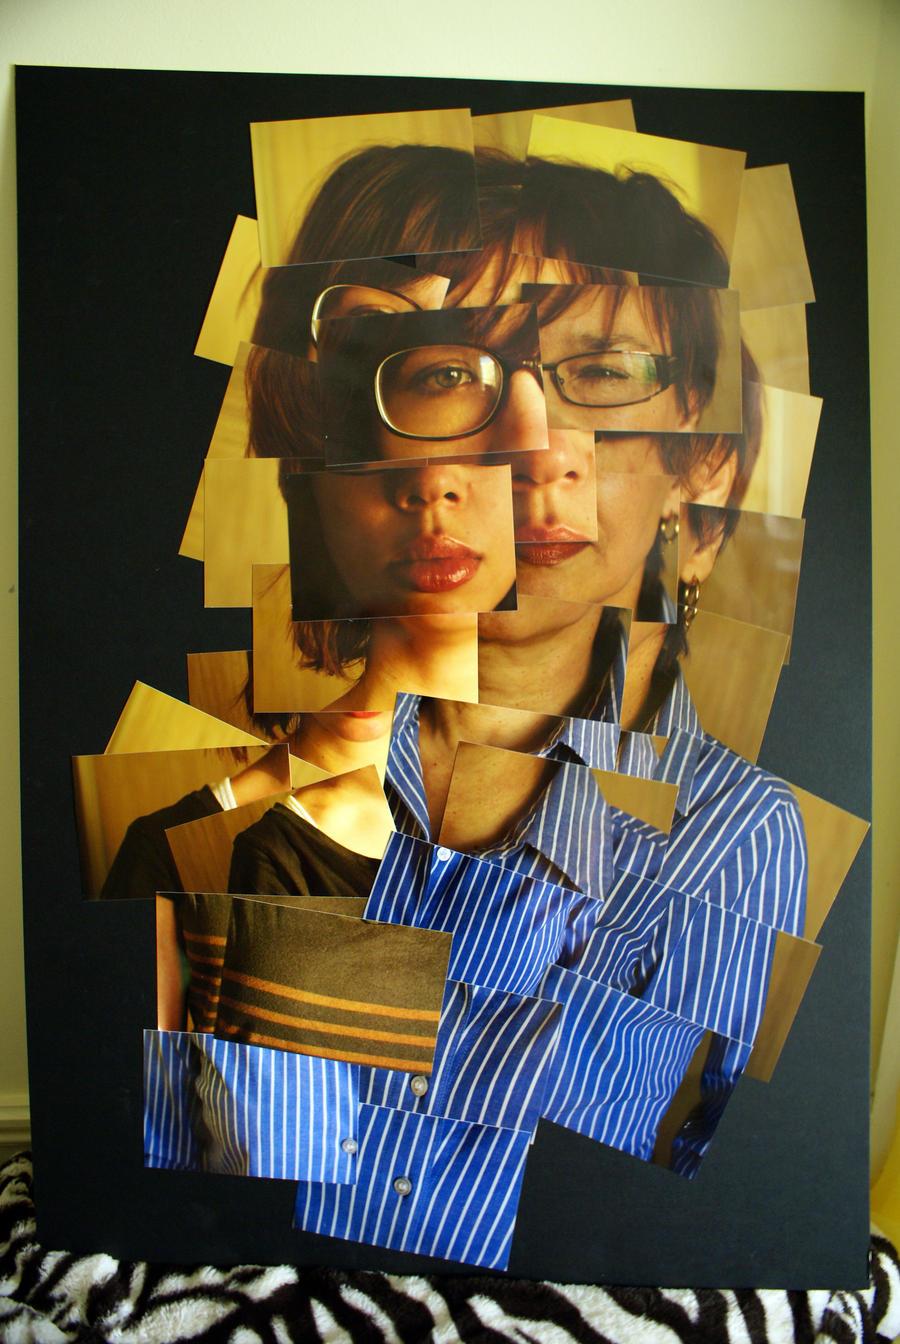 David Hockney Project Photograph by Kelly Green |David Hockney Joiner Project